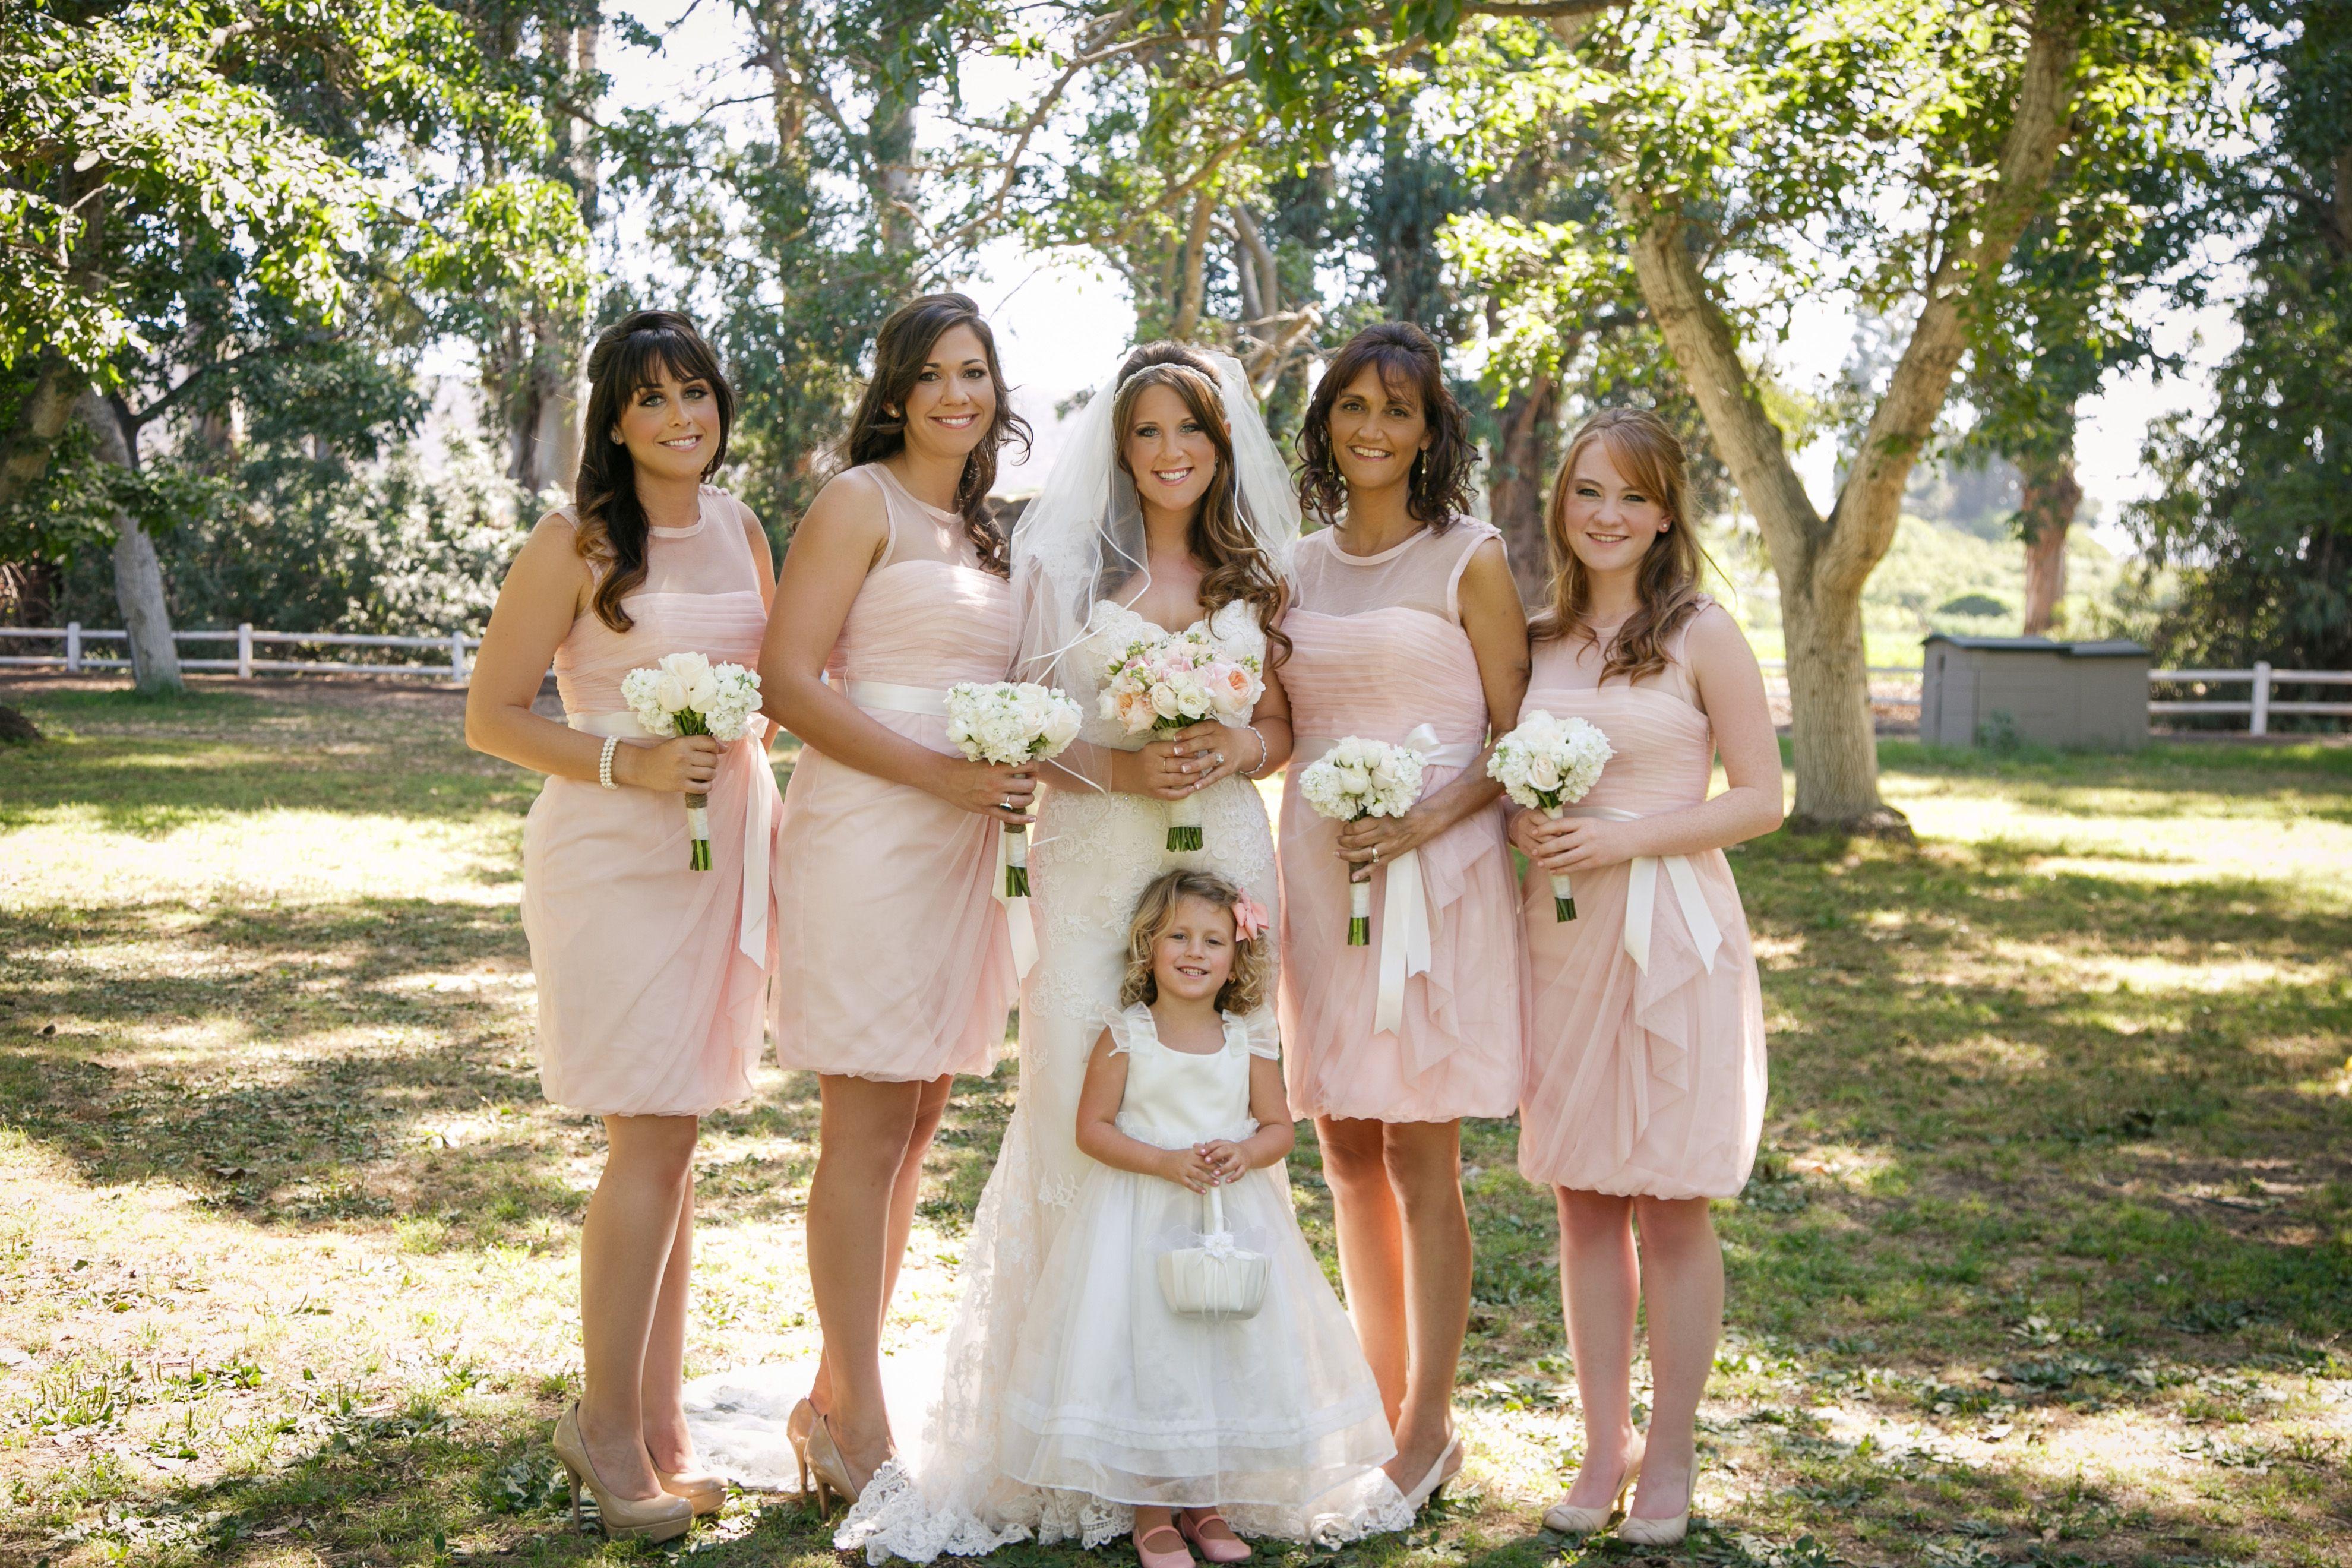 White by vera wang bridesmaid dresses in blush bobbin net dress